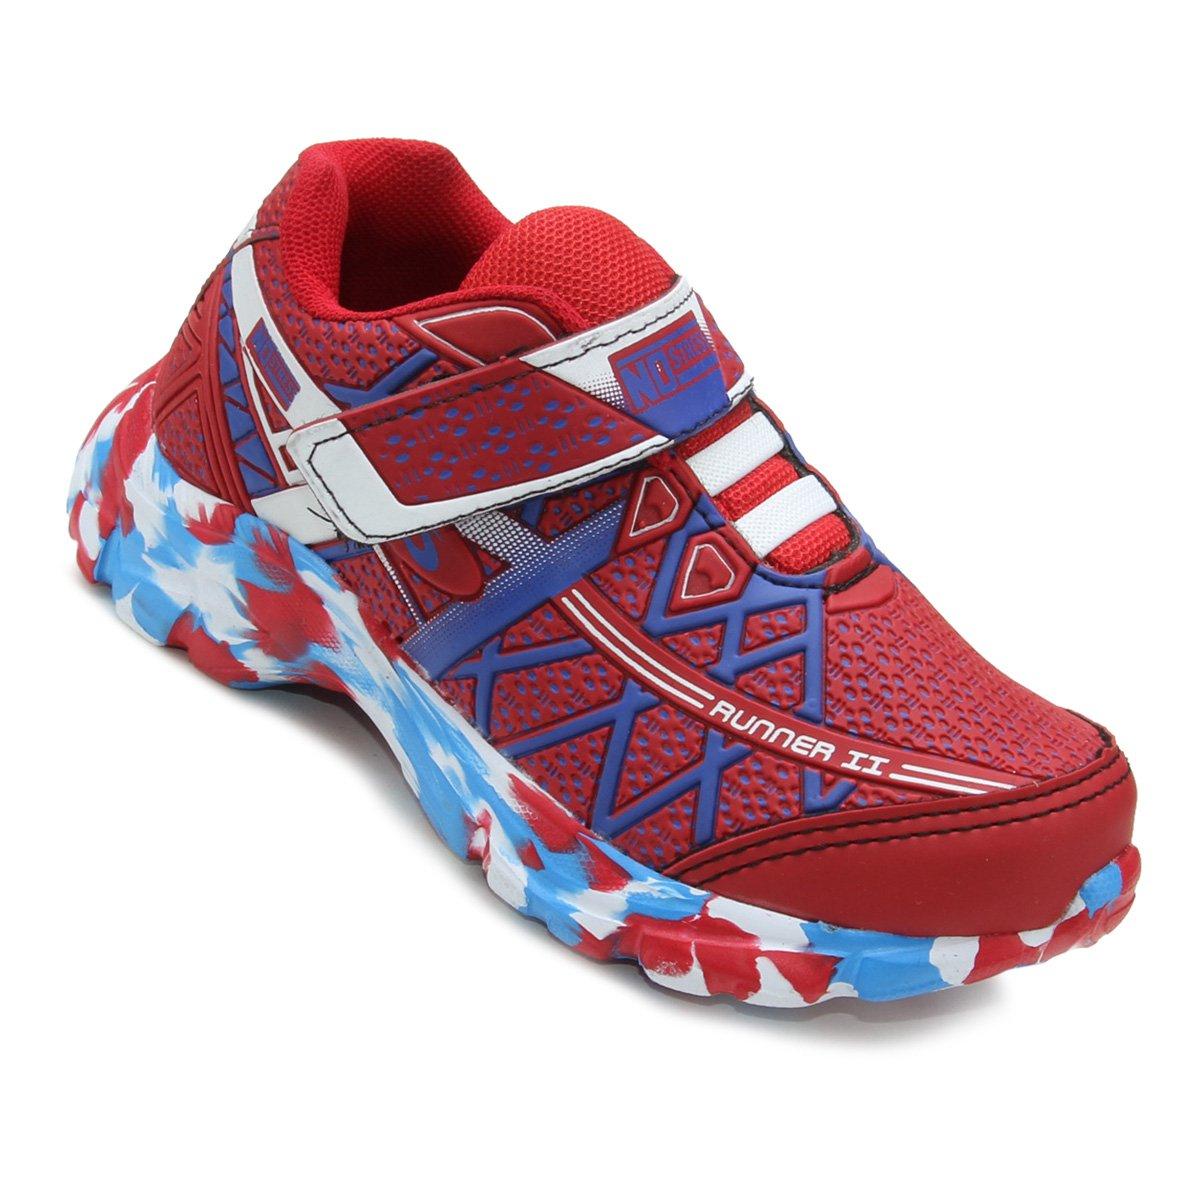 3cdb608132b Tênis Infantil No Stress Running Masculino - Vermelho - Compre Agora ...